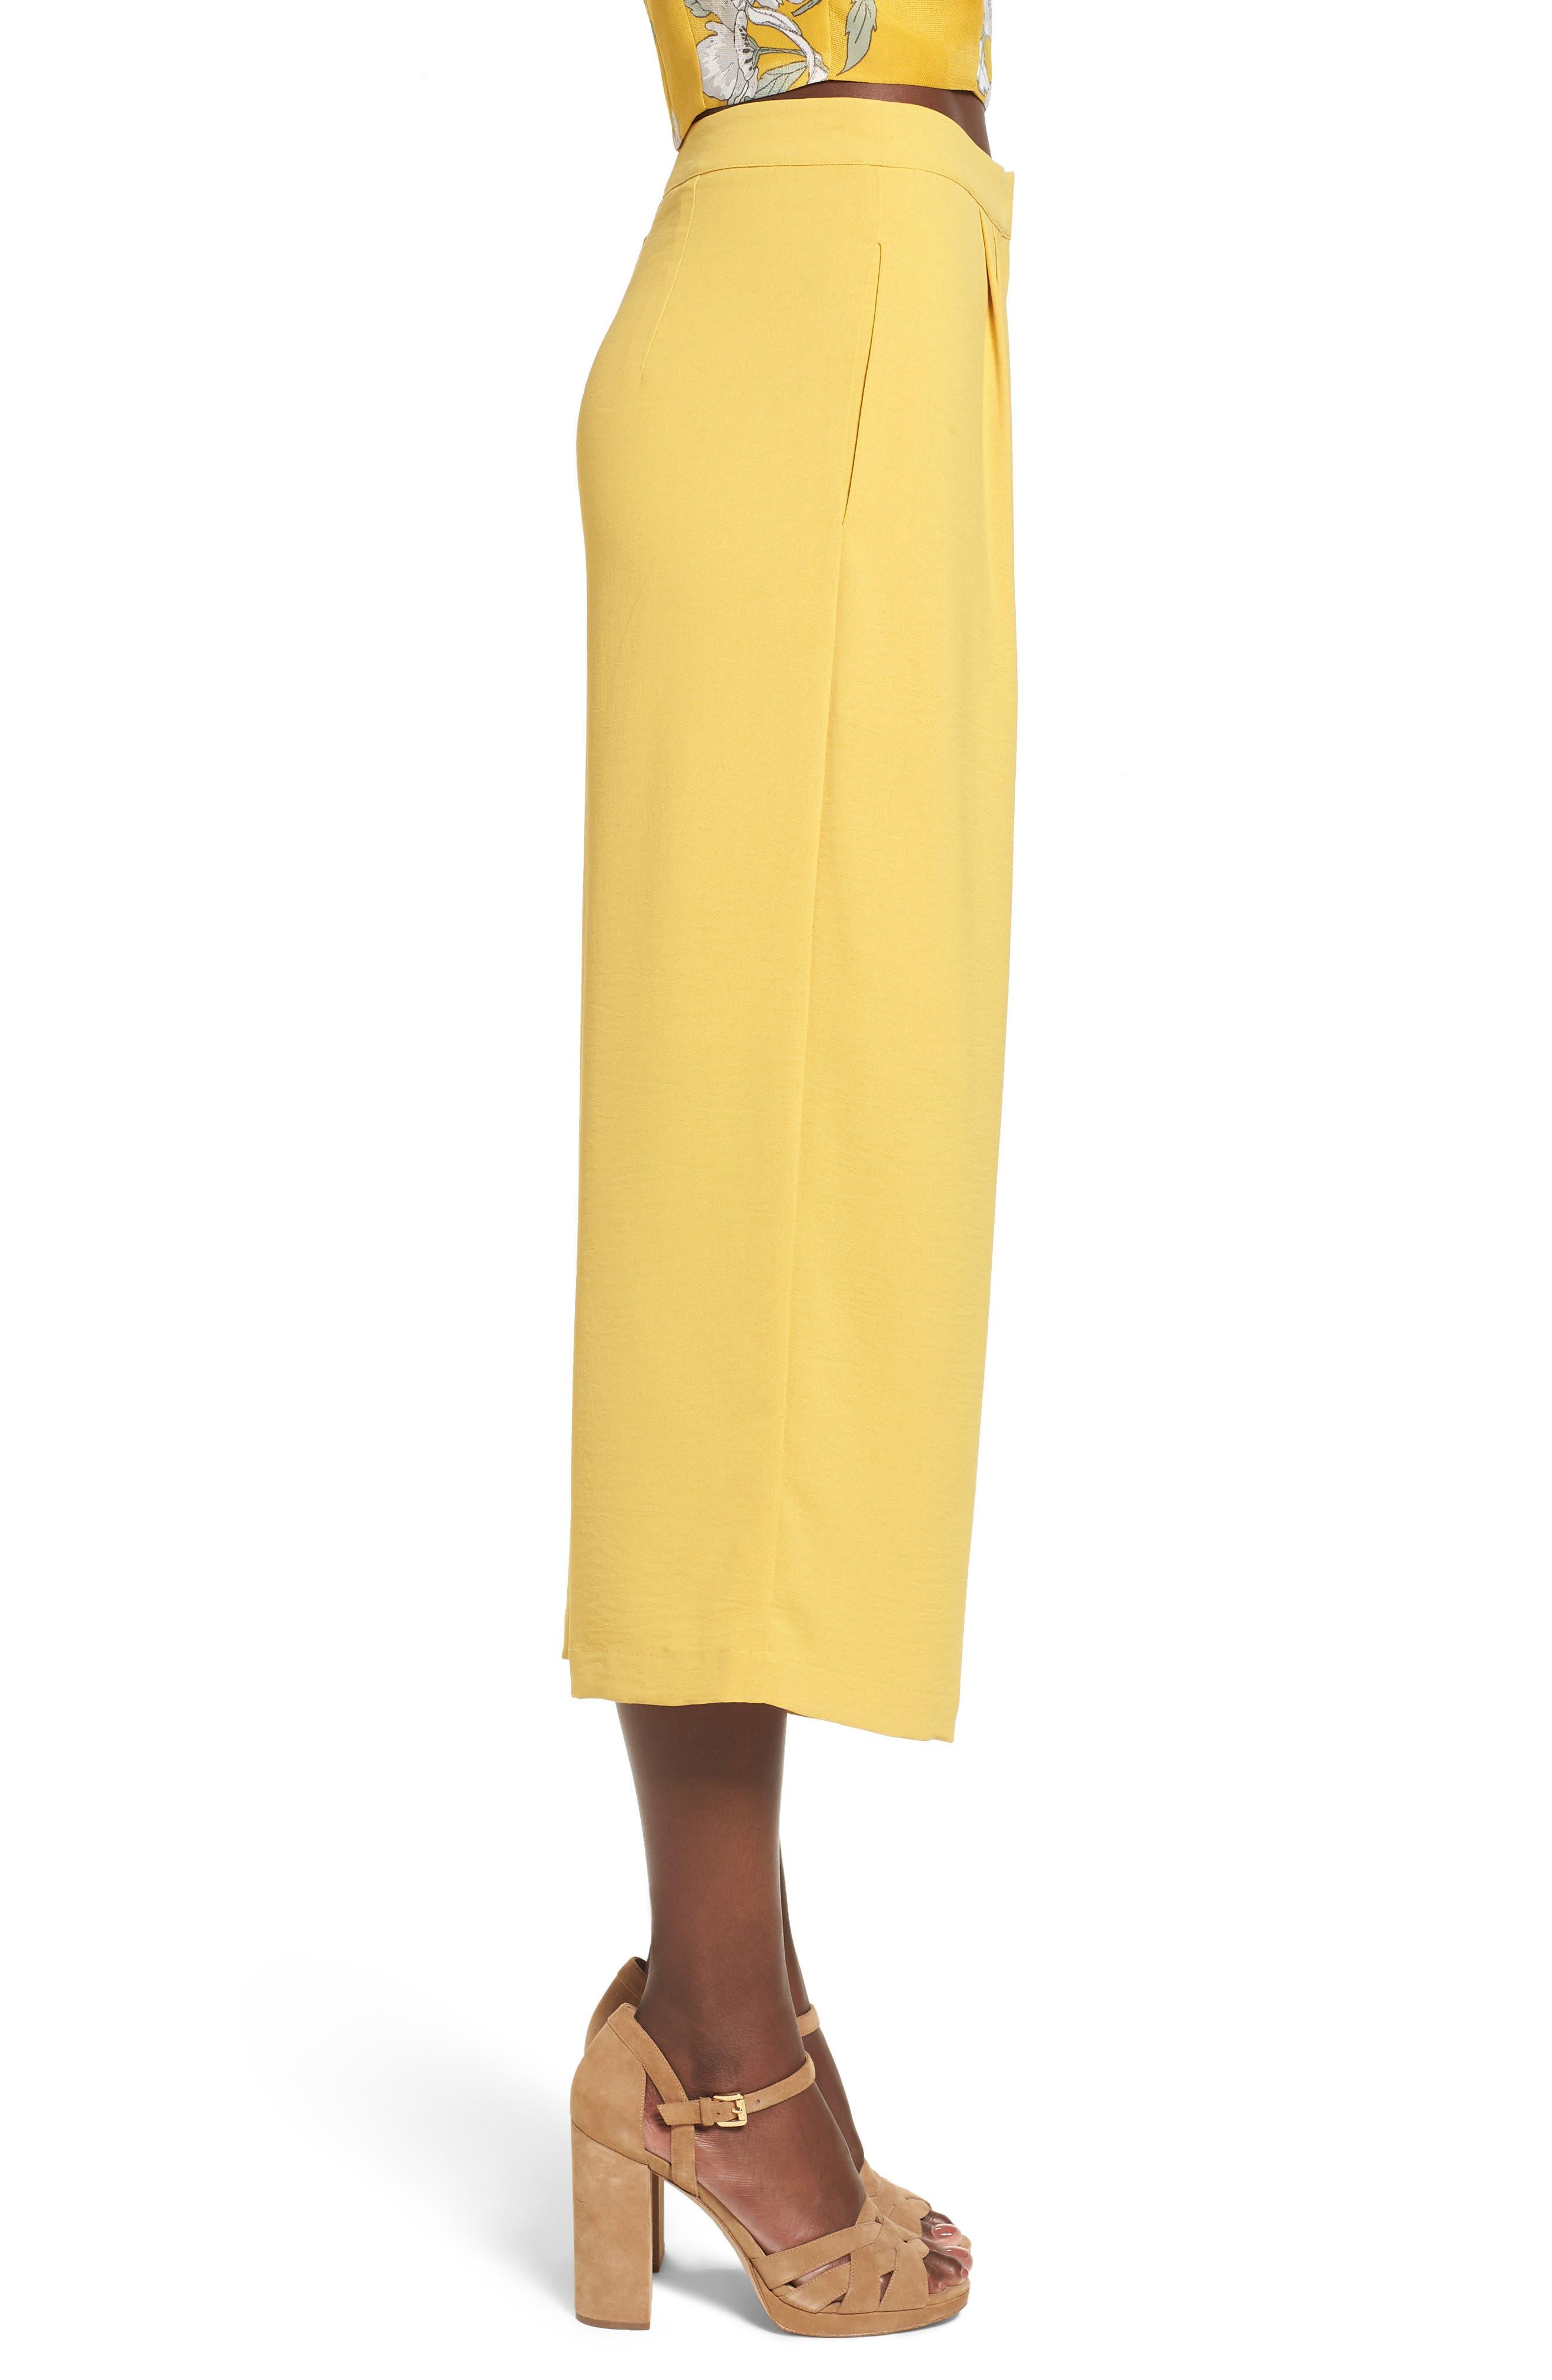 Chriselle x J.O.A. Pleat High Waist Crop Wide Leg Pants,                             Alternate thumbnail 5, color,                             Roman Gold